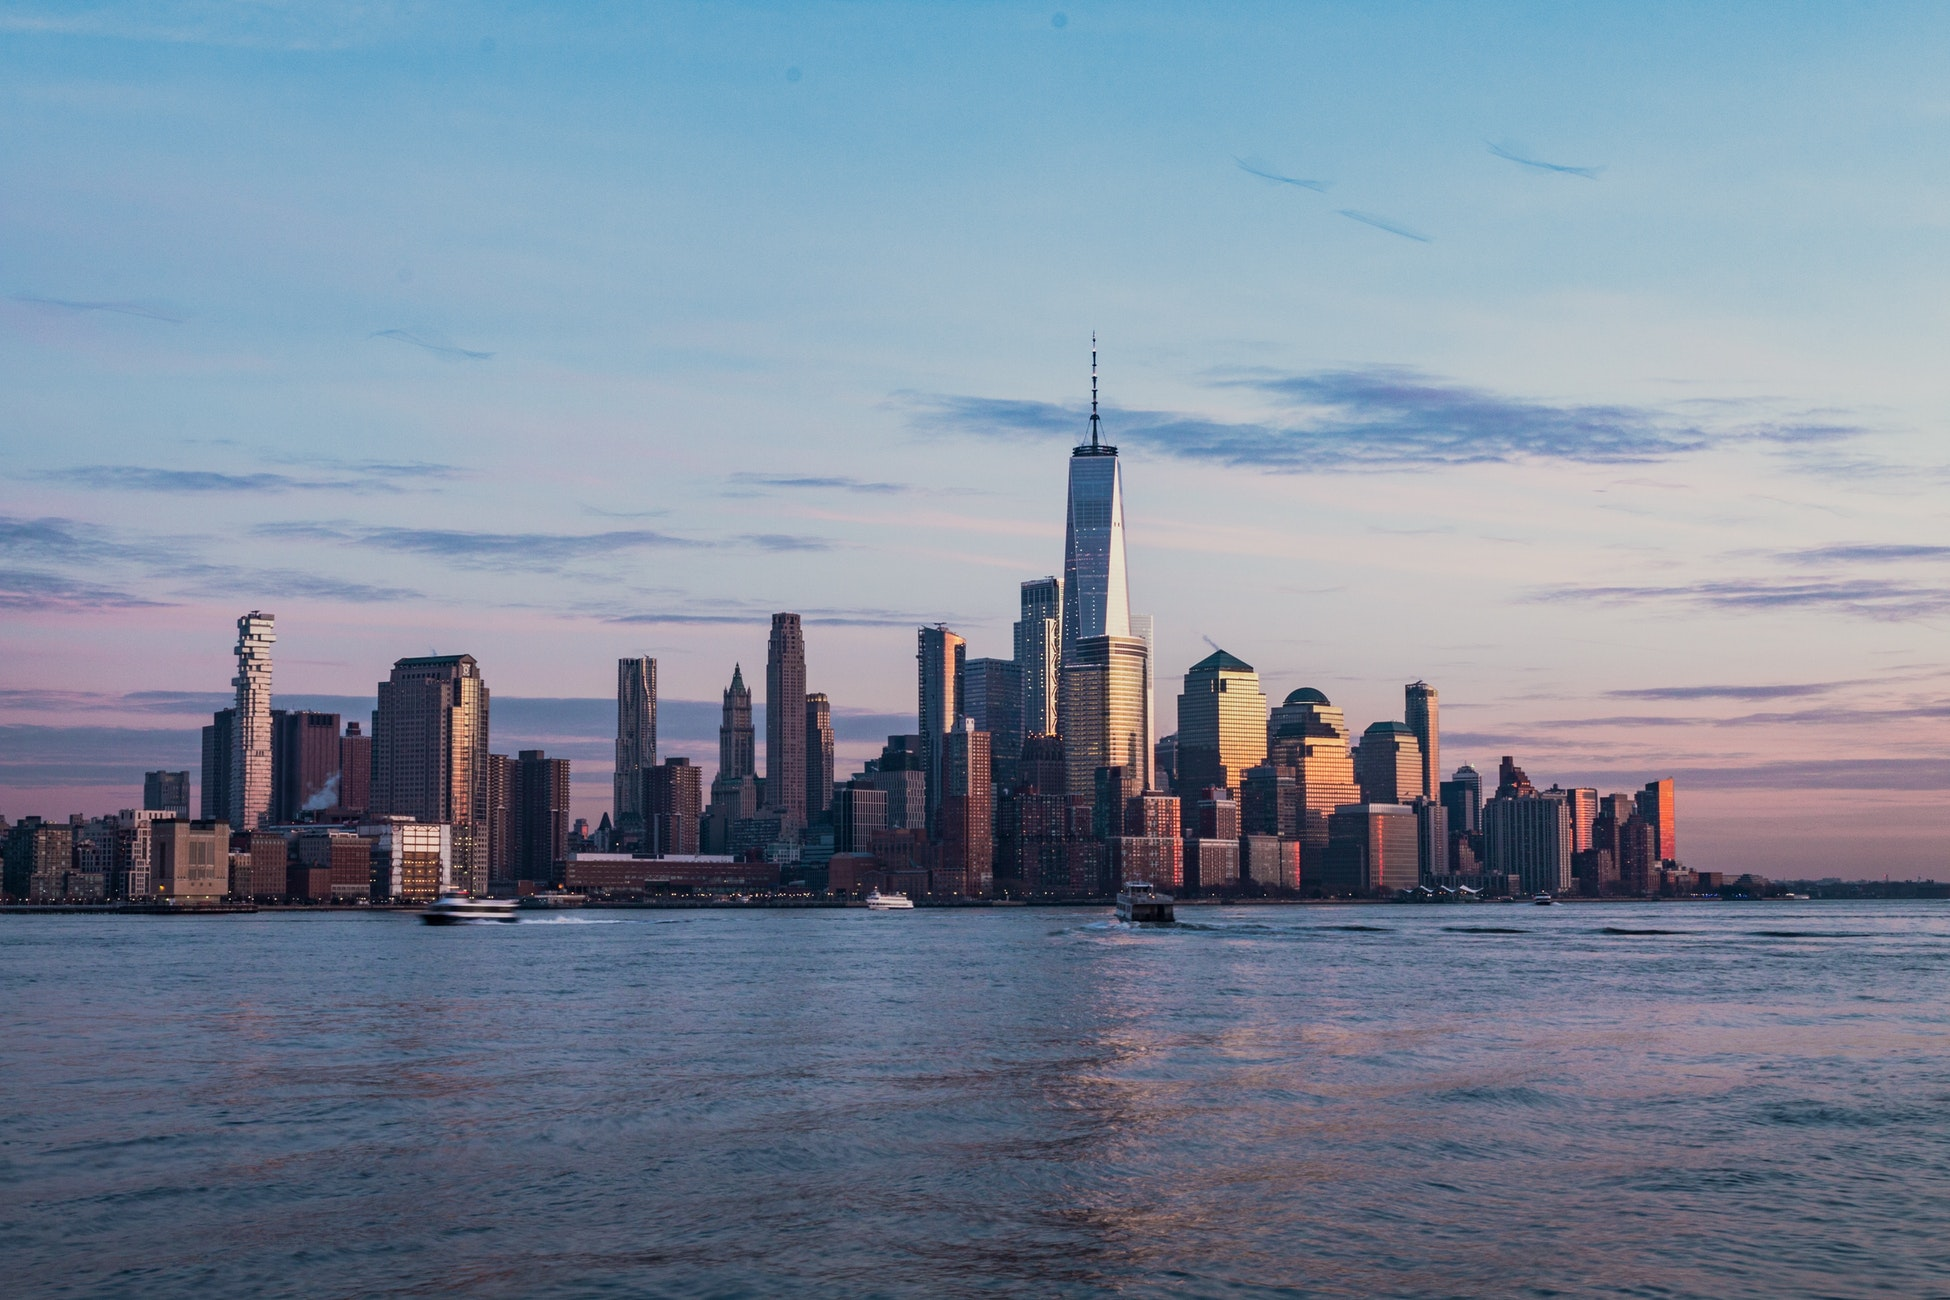 new york - Frank WilliamsNAAF Vice Presidentfikwilliams@msn.com